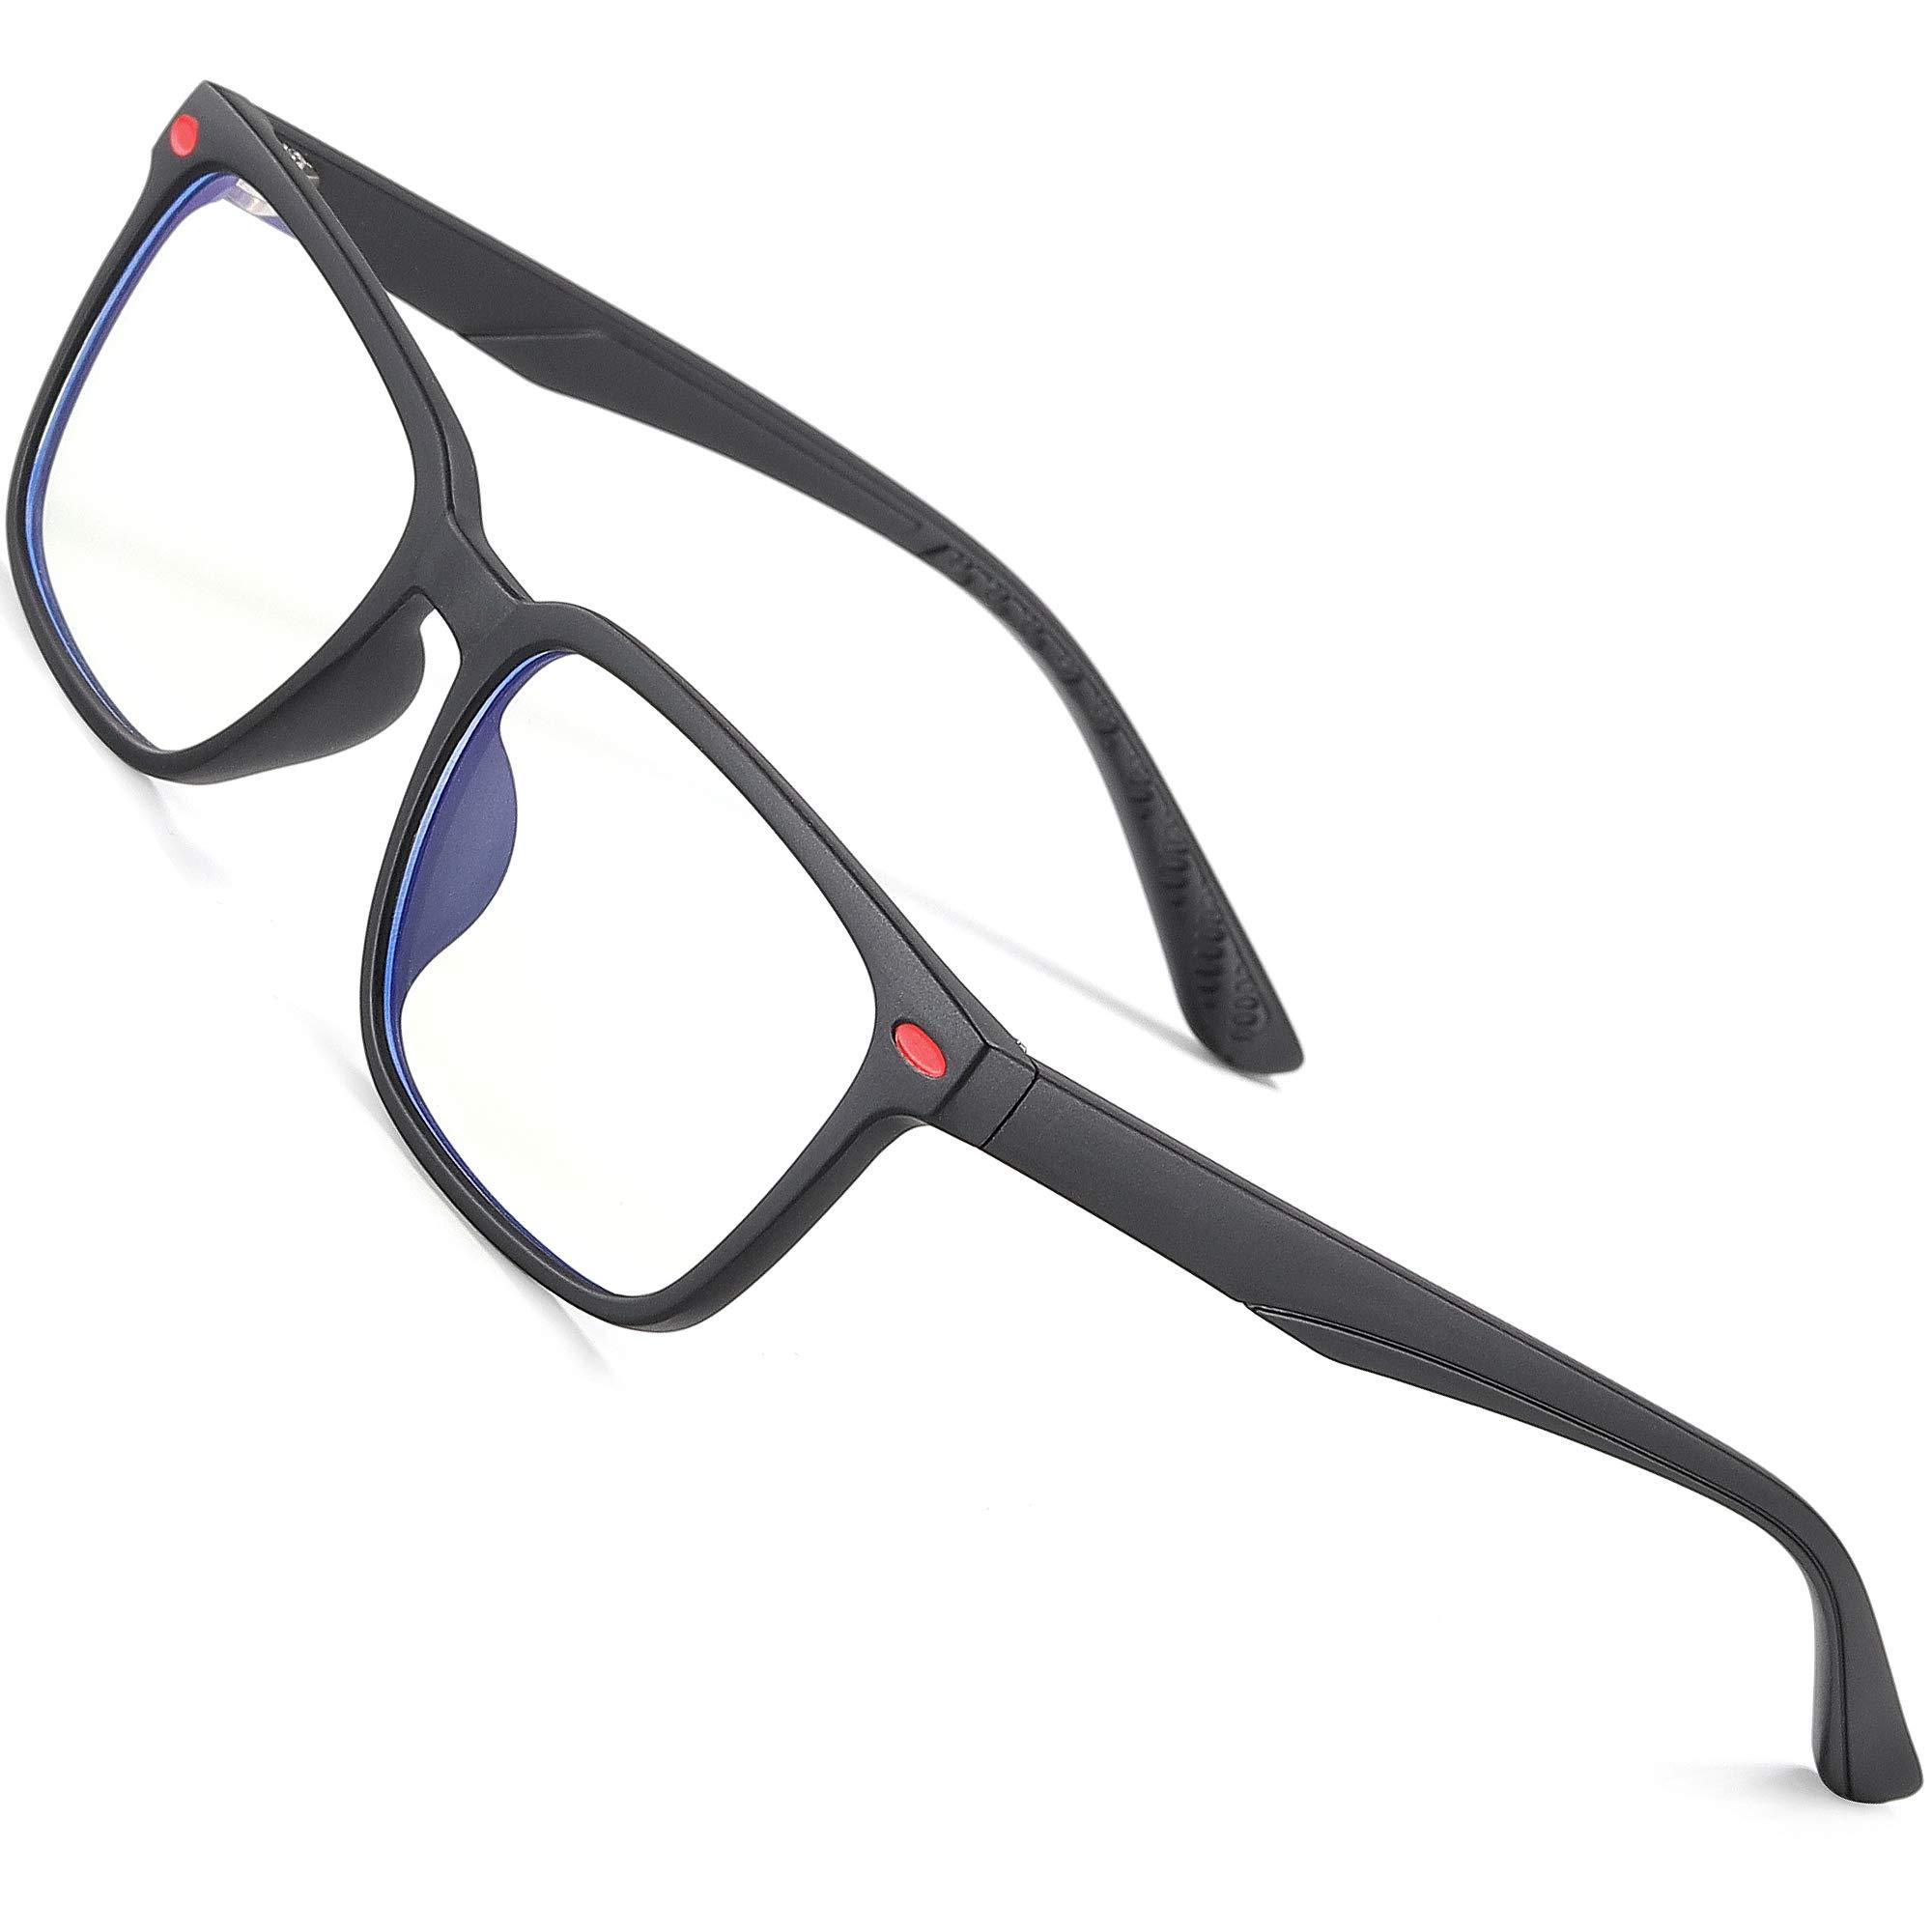 ATTCL Computer Blue Light Blocking Glasses for Kids Age 3-10 Game Glasses 5101 Black